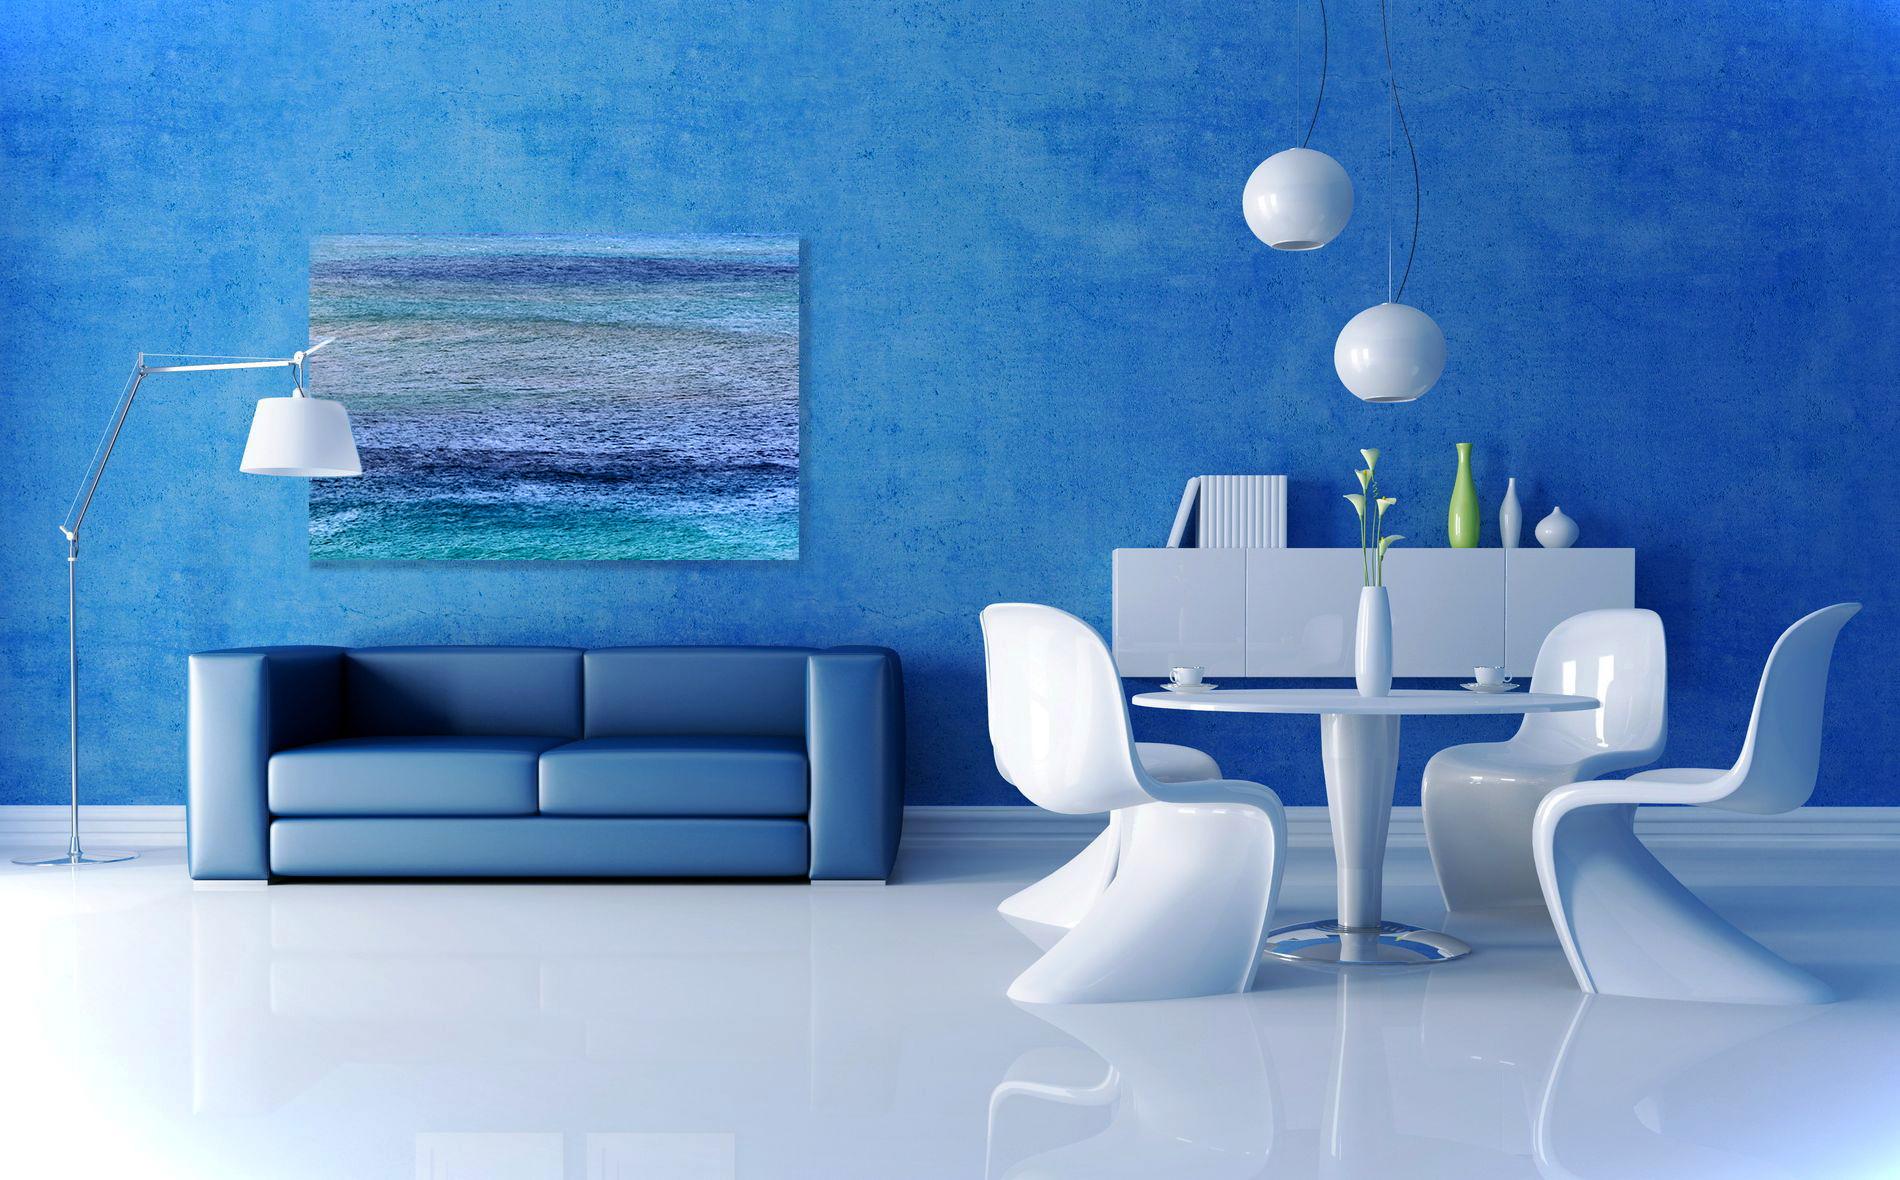 wall-blue copy.jpg